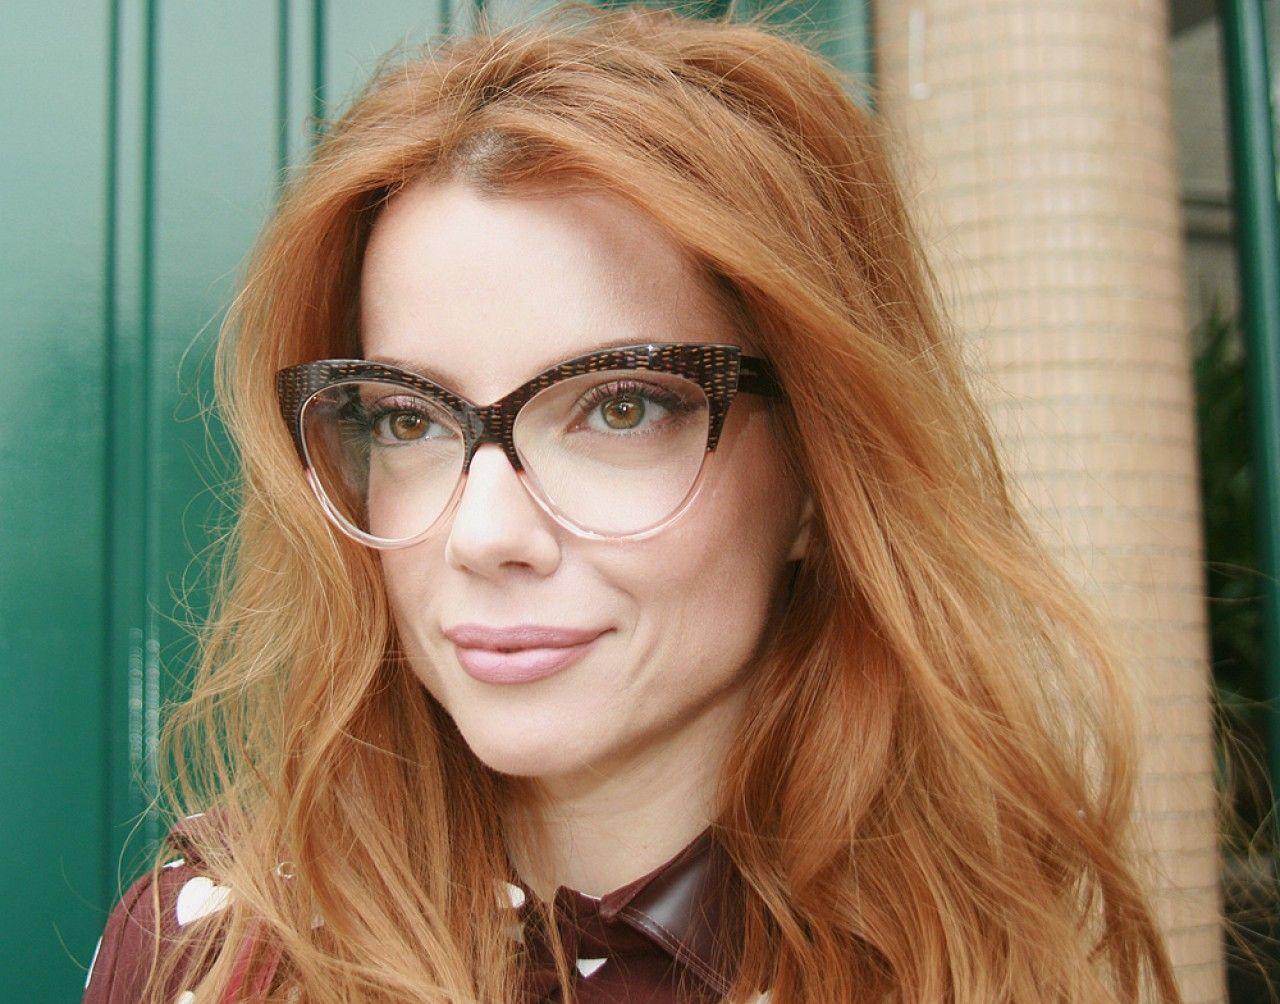 Julia Petit – Petiscos   HAIR   Pinterest   Óculos, Óculos chilli ... 31af44c097